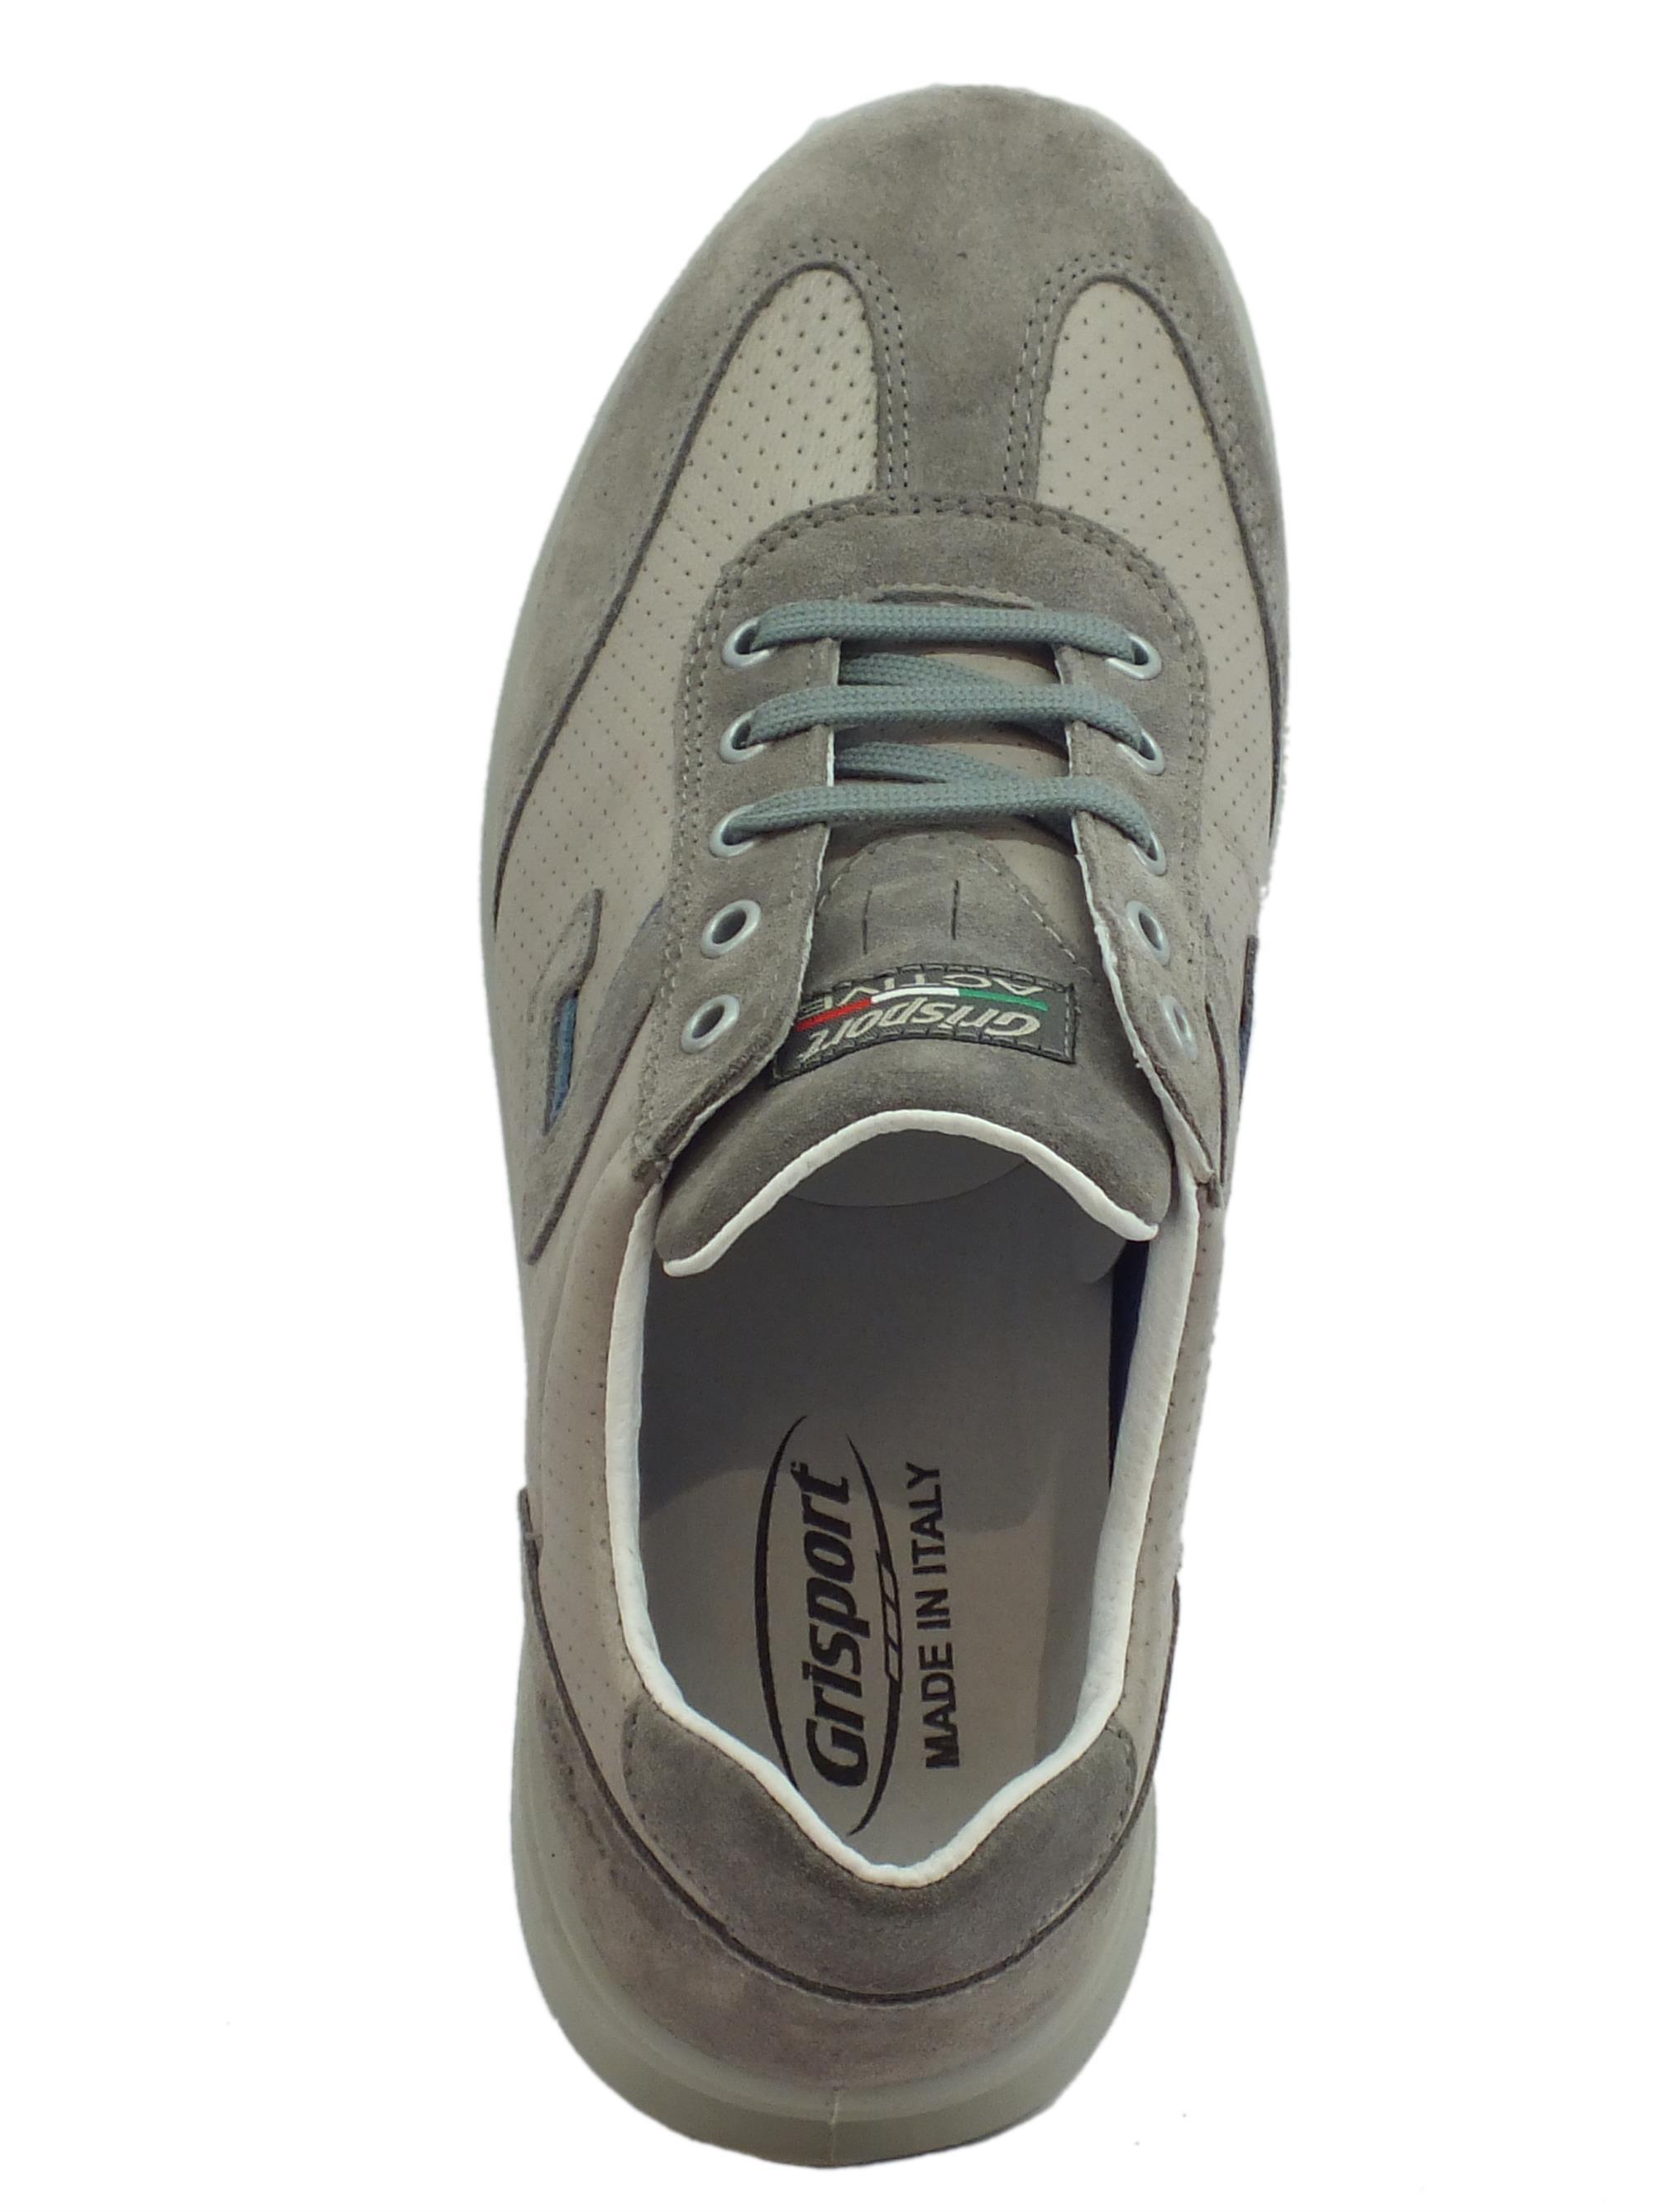 ... Scarpe Grisport Active per uomo in nabuk e pelle grigio antistatica cfd89d9d481